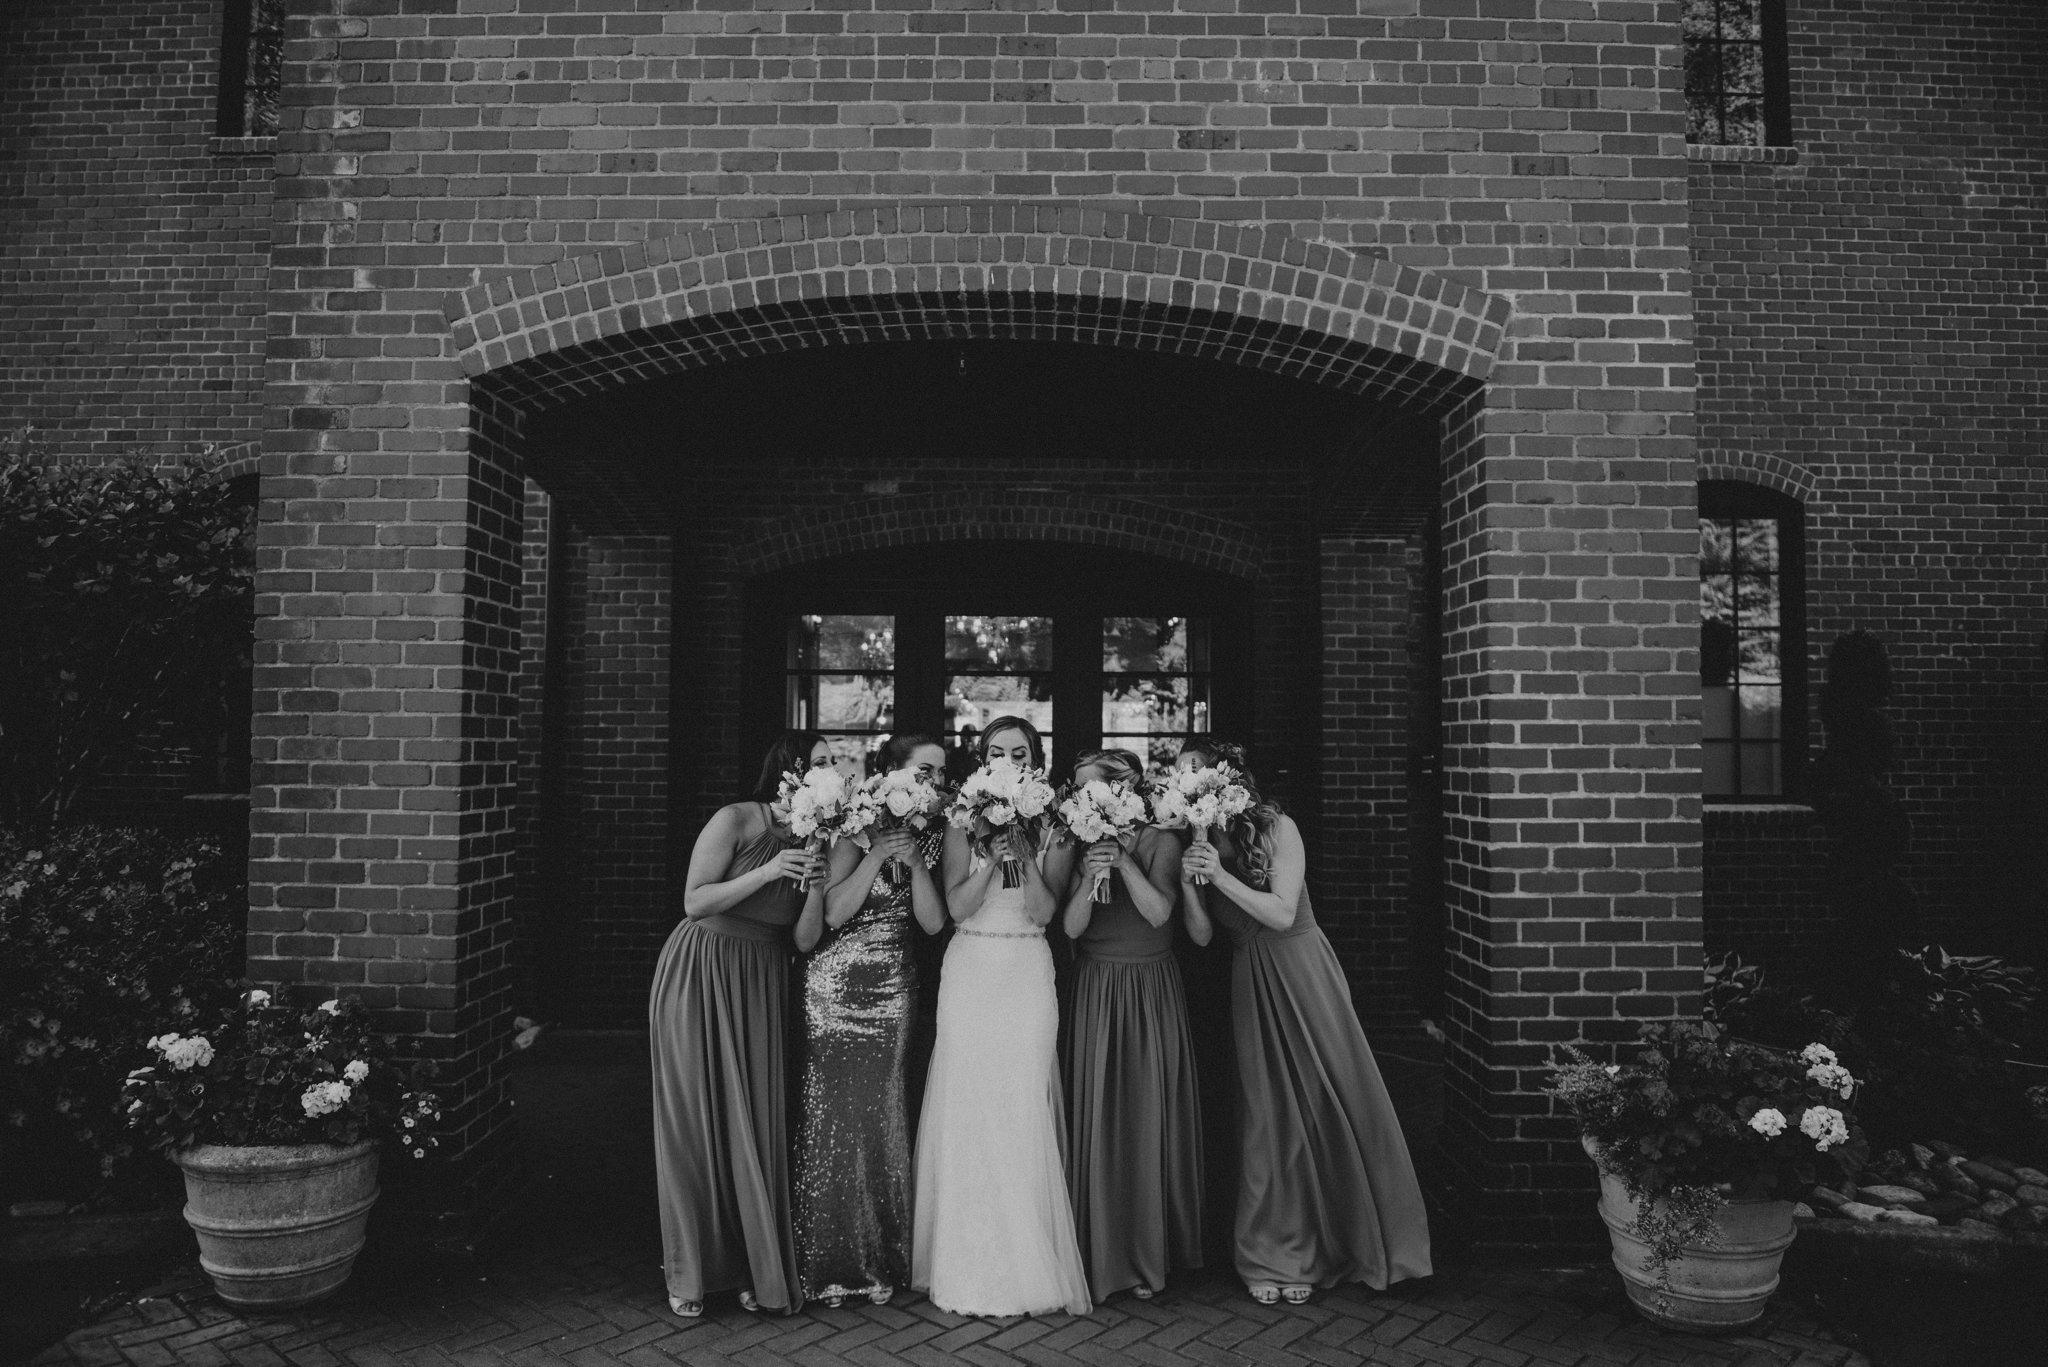 hollywood-school-house-wedding-seattle-photographer-caitlyn-nikula-57.jpg